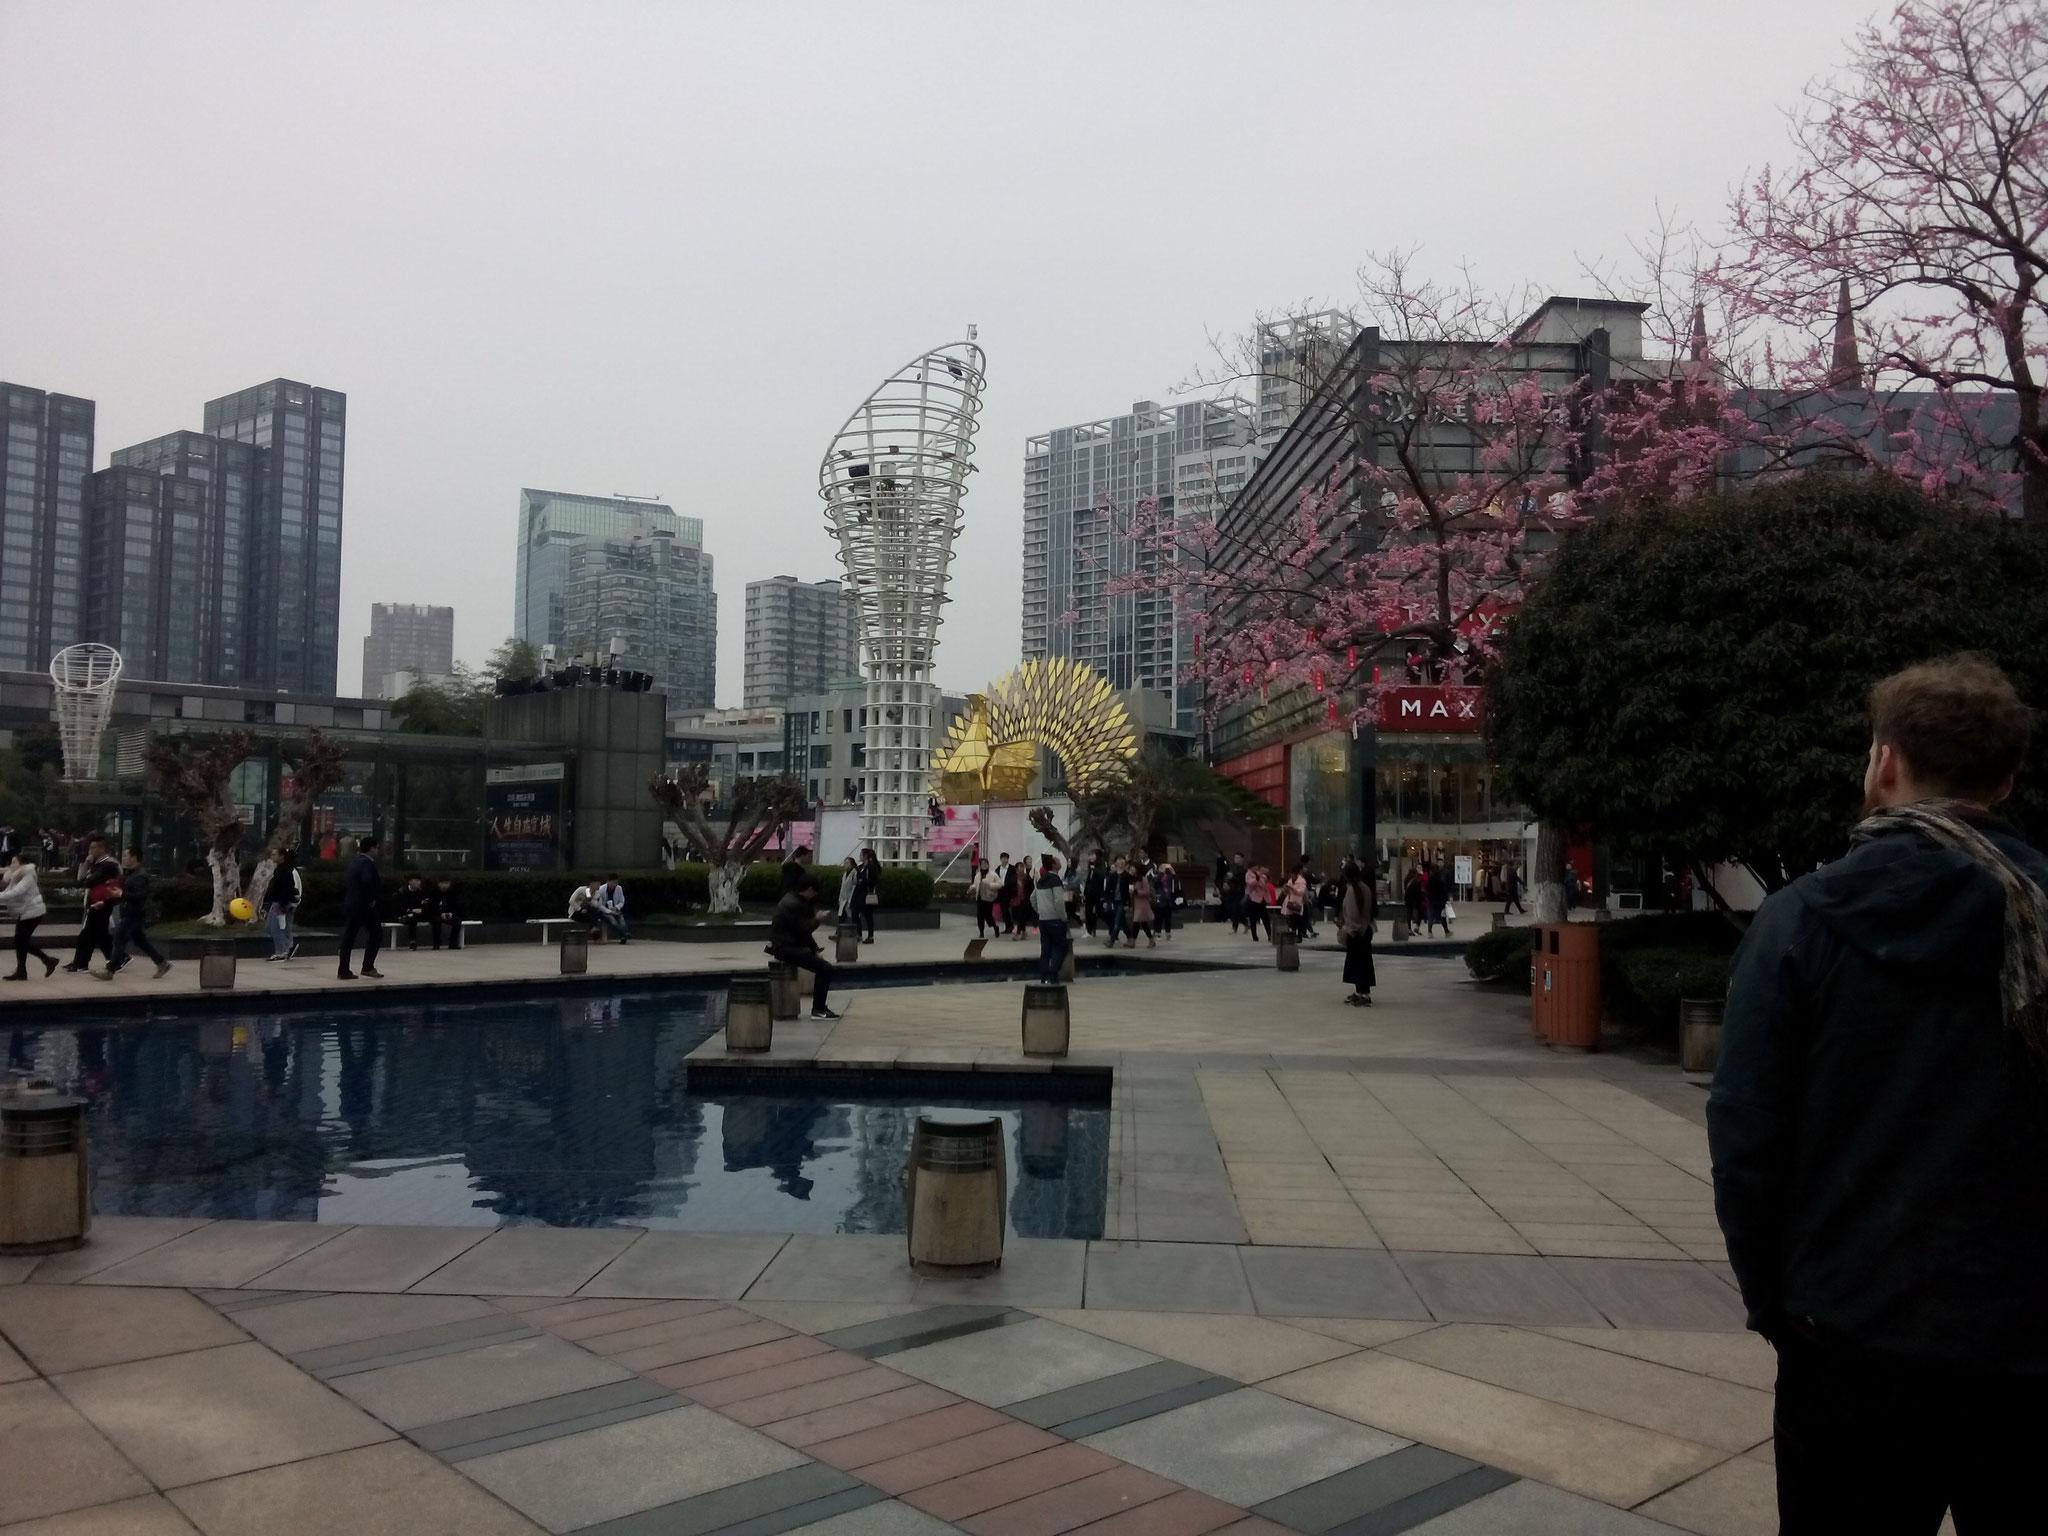 Tianyi Platz